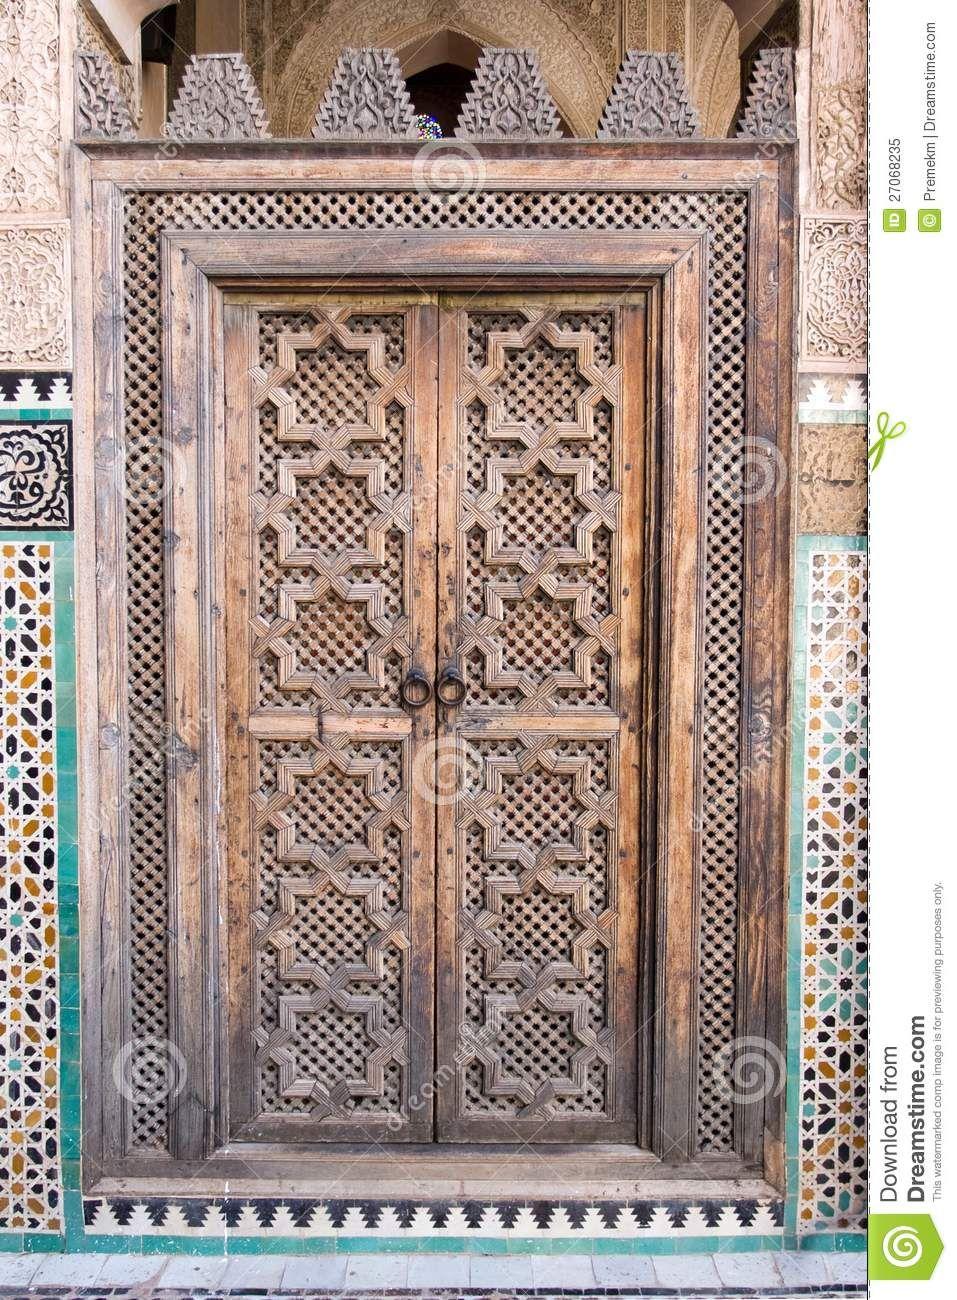 oriental-door-madarsa-fes-morocco-27068235.jpg (957×1300) & oriental-door-madarsa-fes-morocco-27068235.jpg (957×1300) | Doors ...